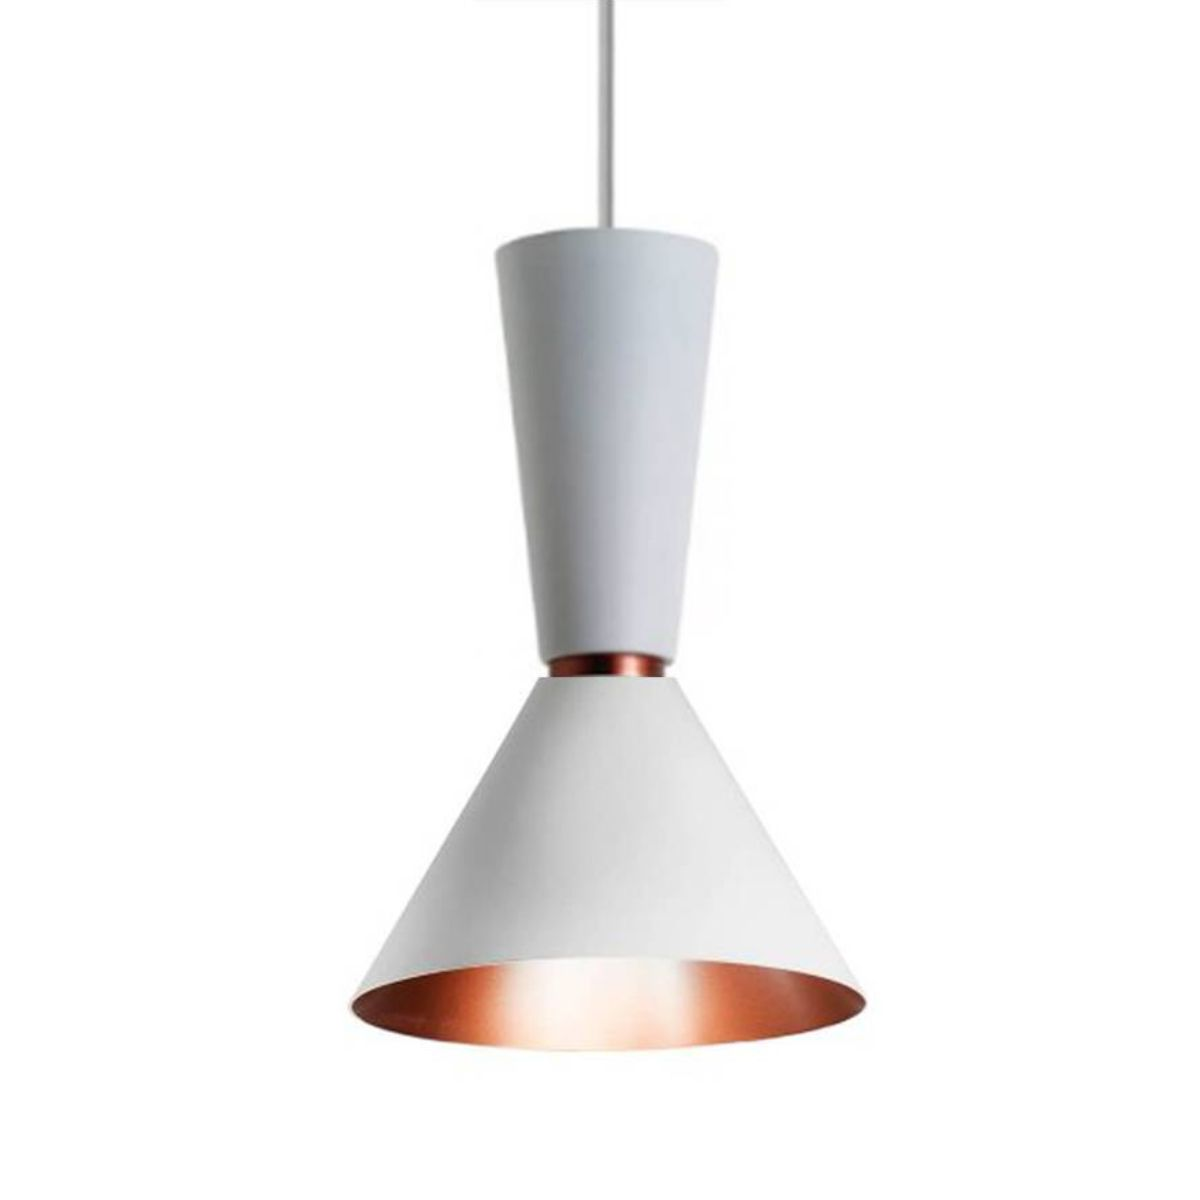 Pendente Alumínio Branco/Cobre - Bambola 30cm Cozinha/Bancada